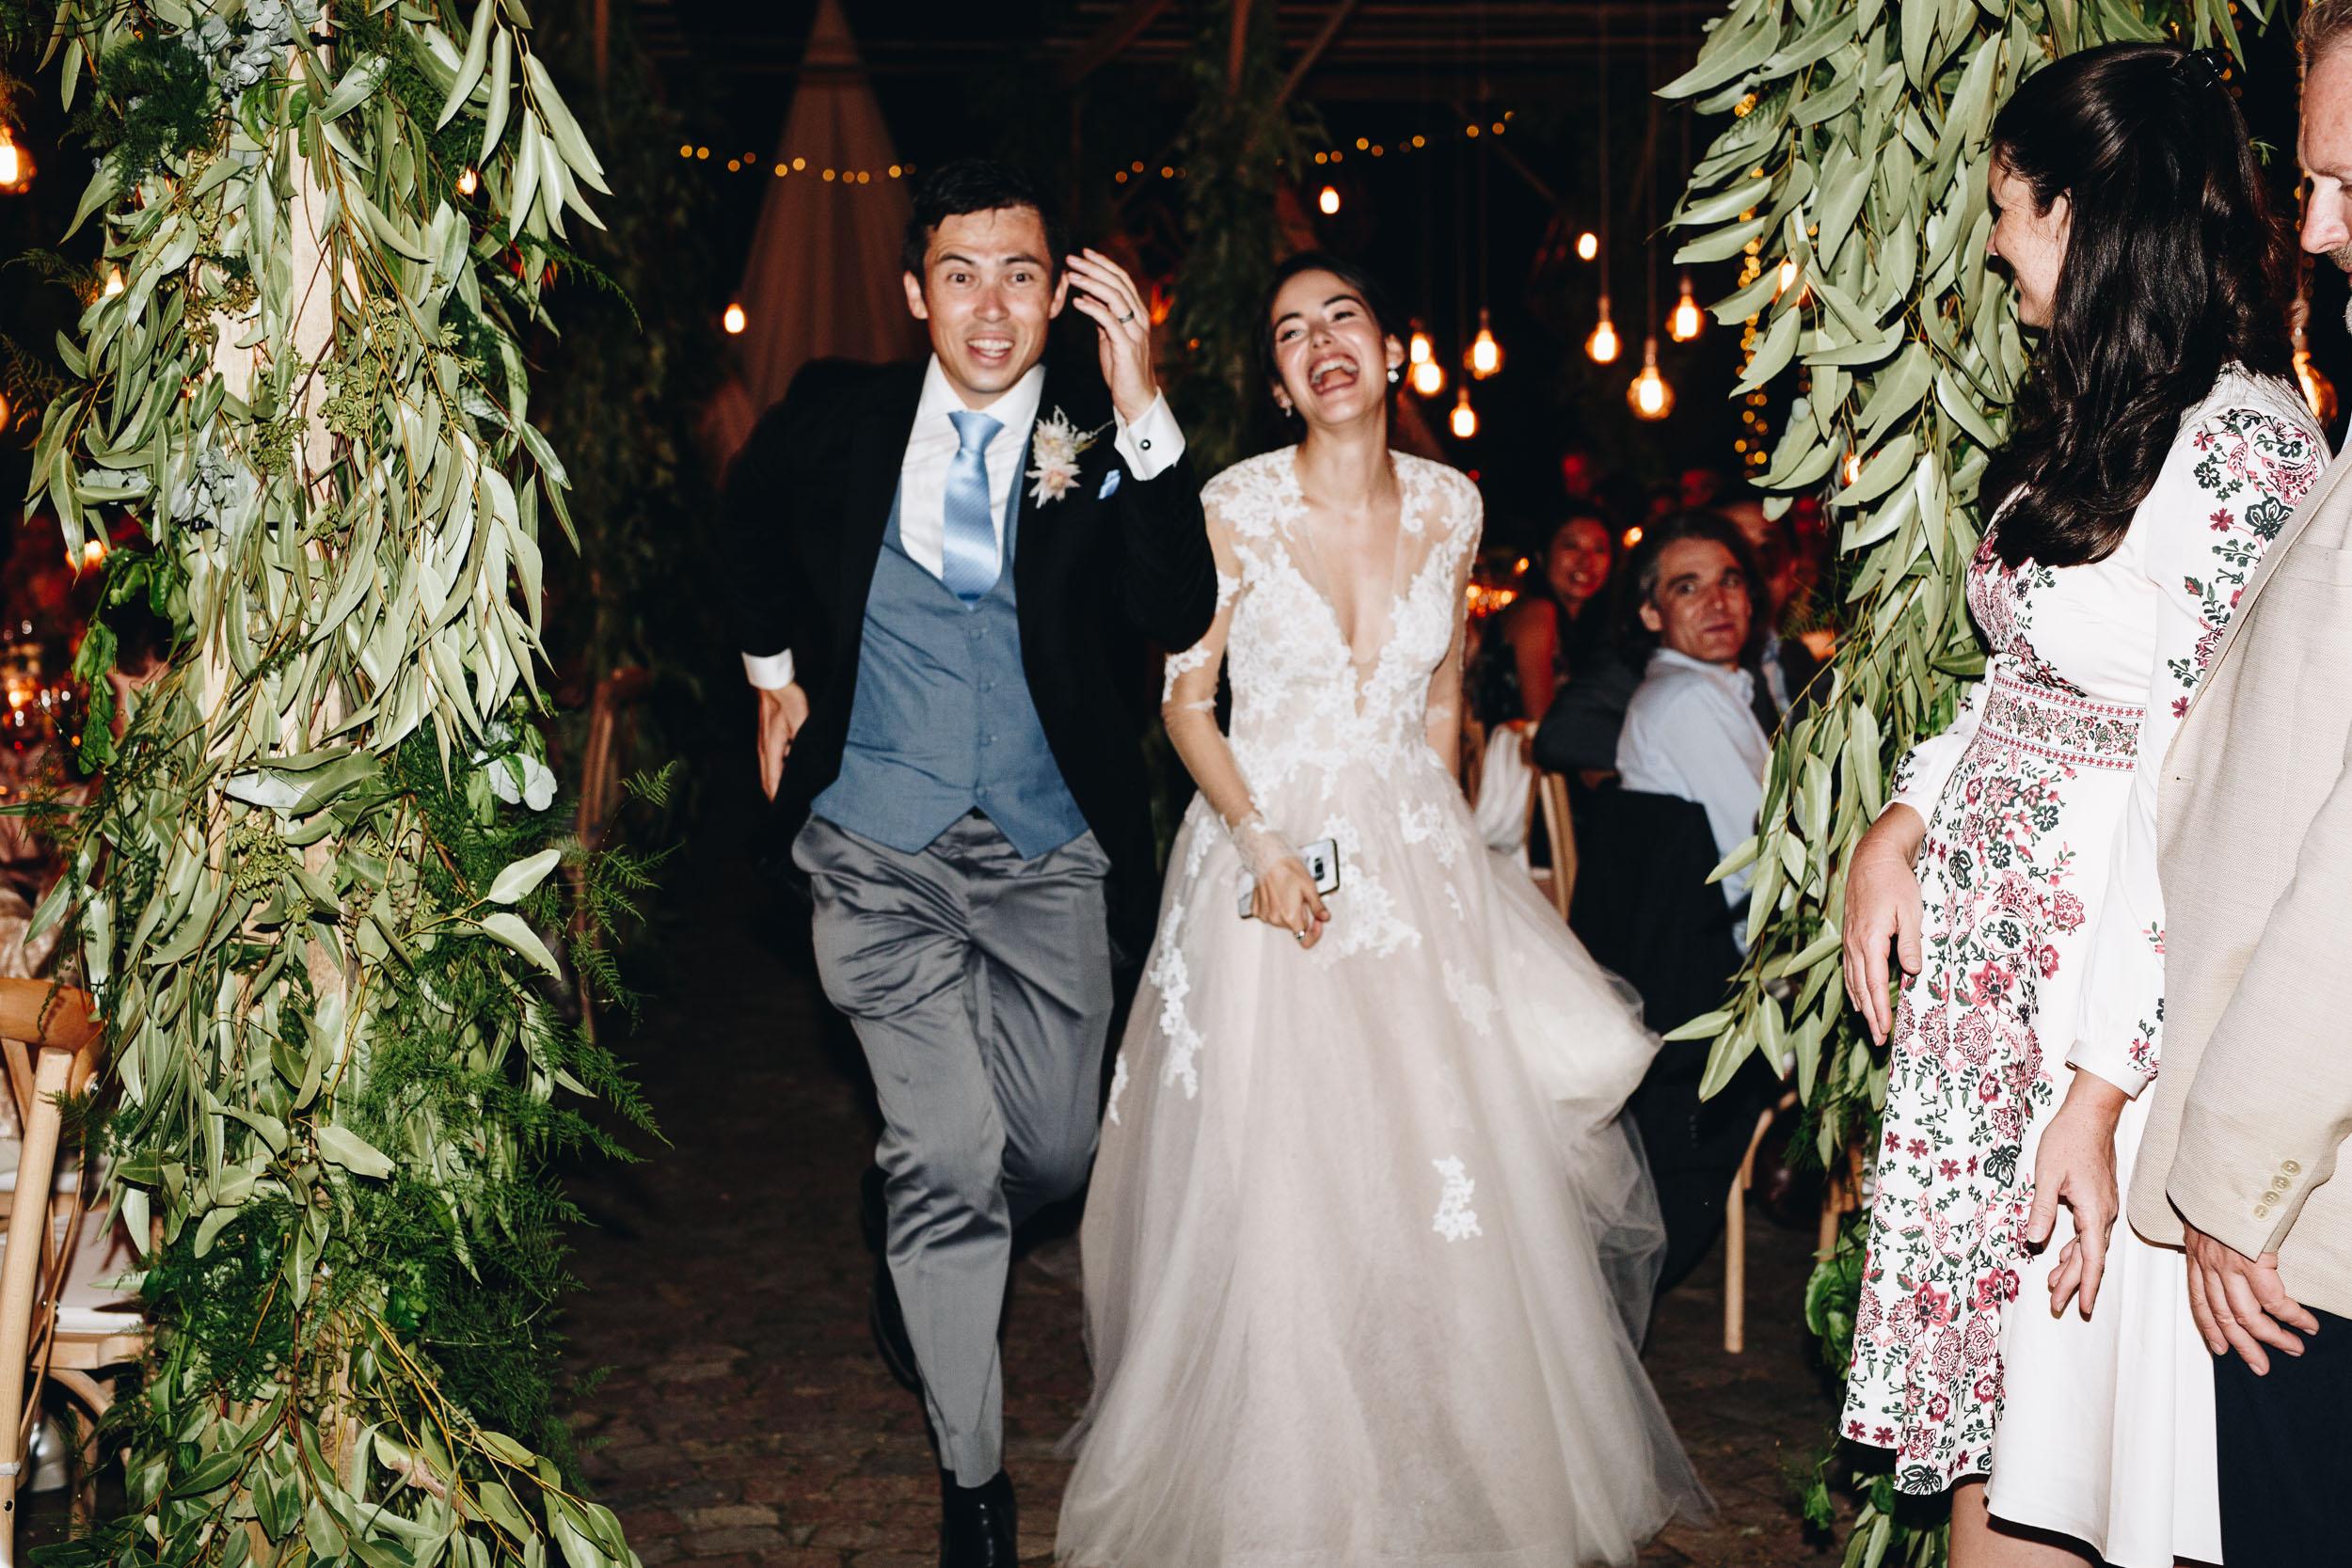 Jenny-Rockett-John-Scranton-Cape-Town-Wedding-Photographer-Andrea-Kellan-223.jpg